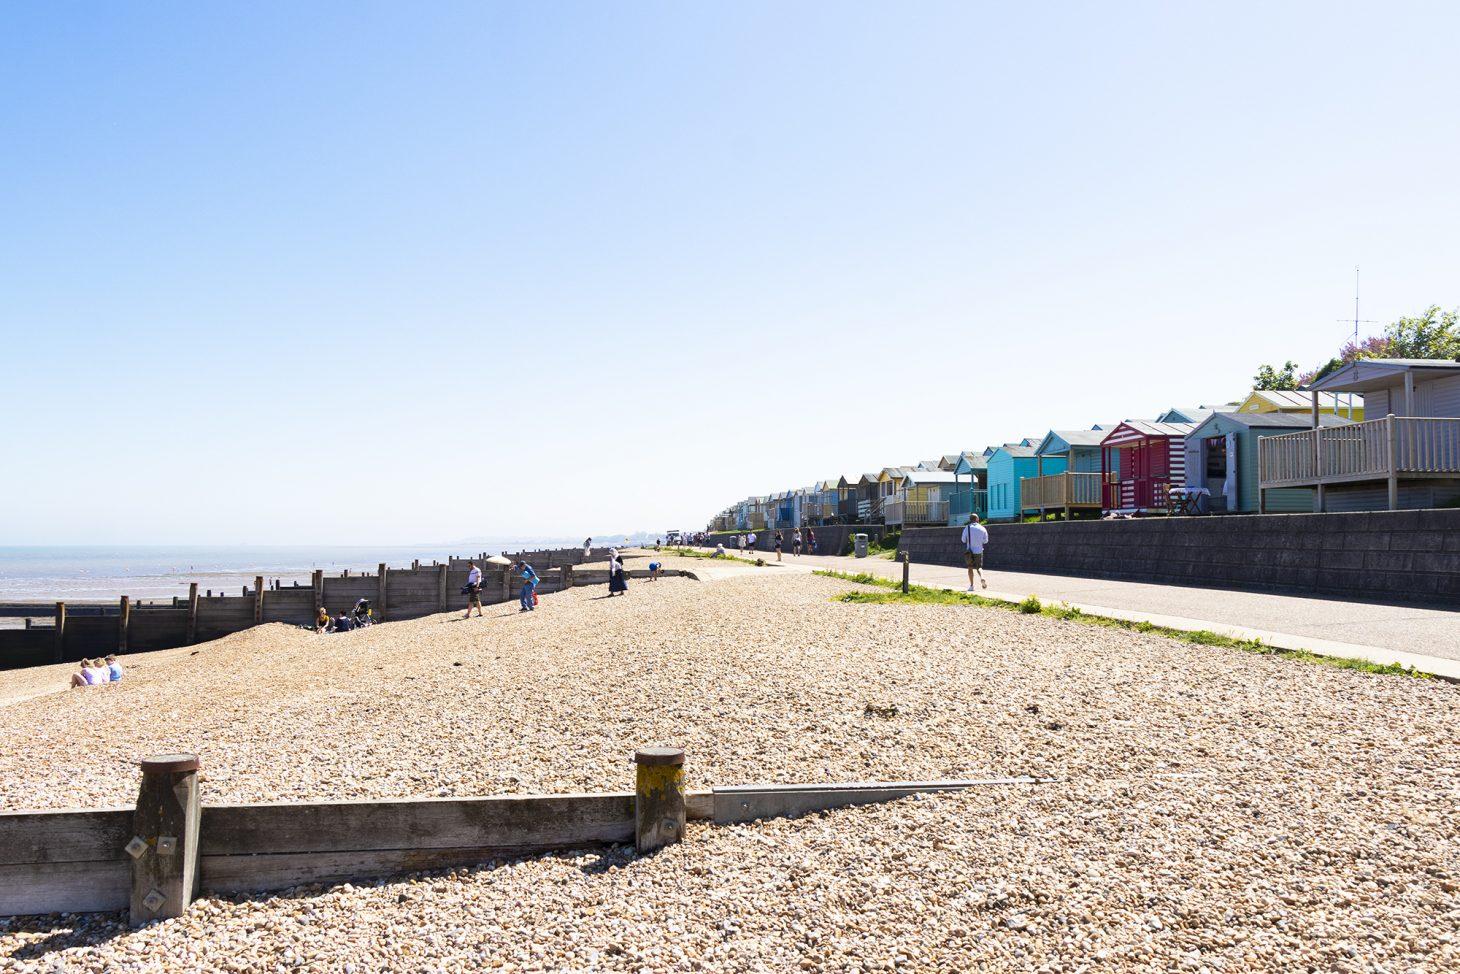 Tankerton Beach, Whitstable